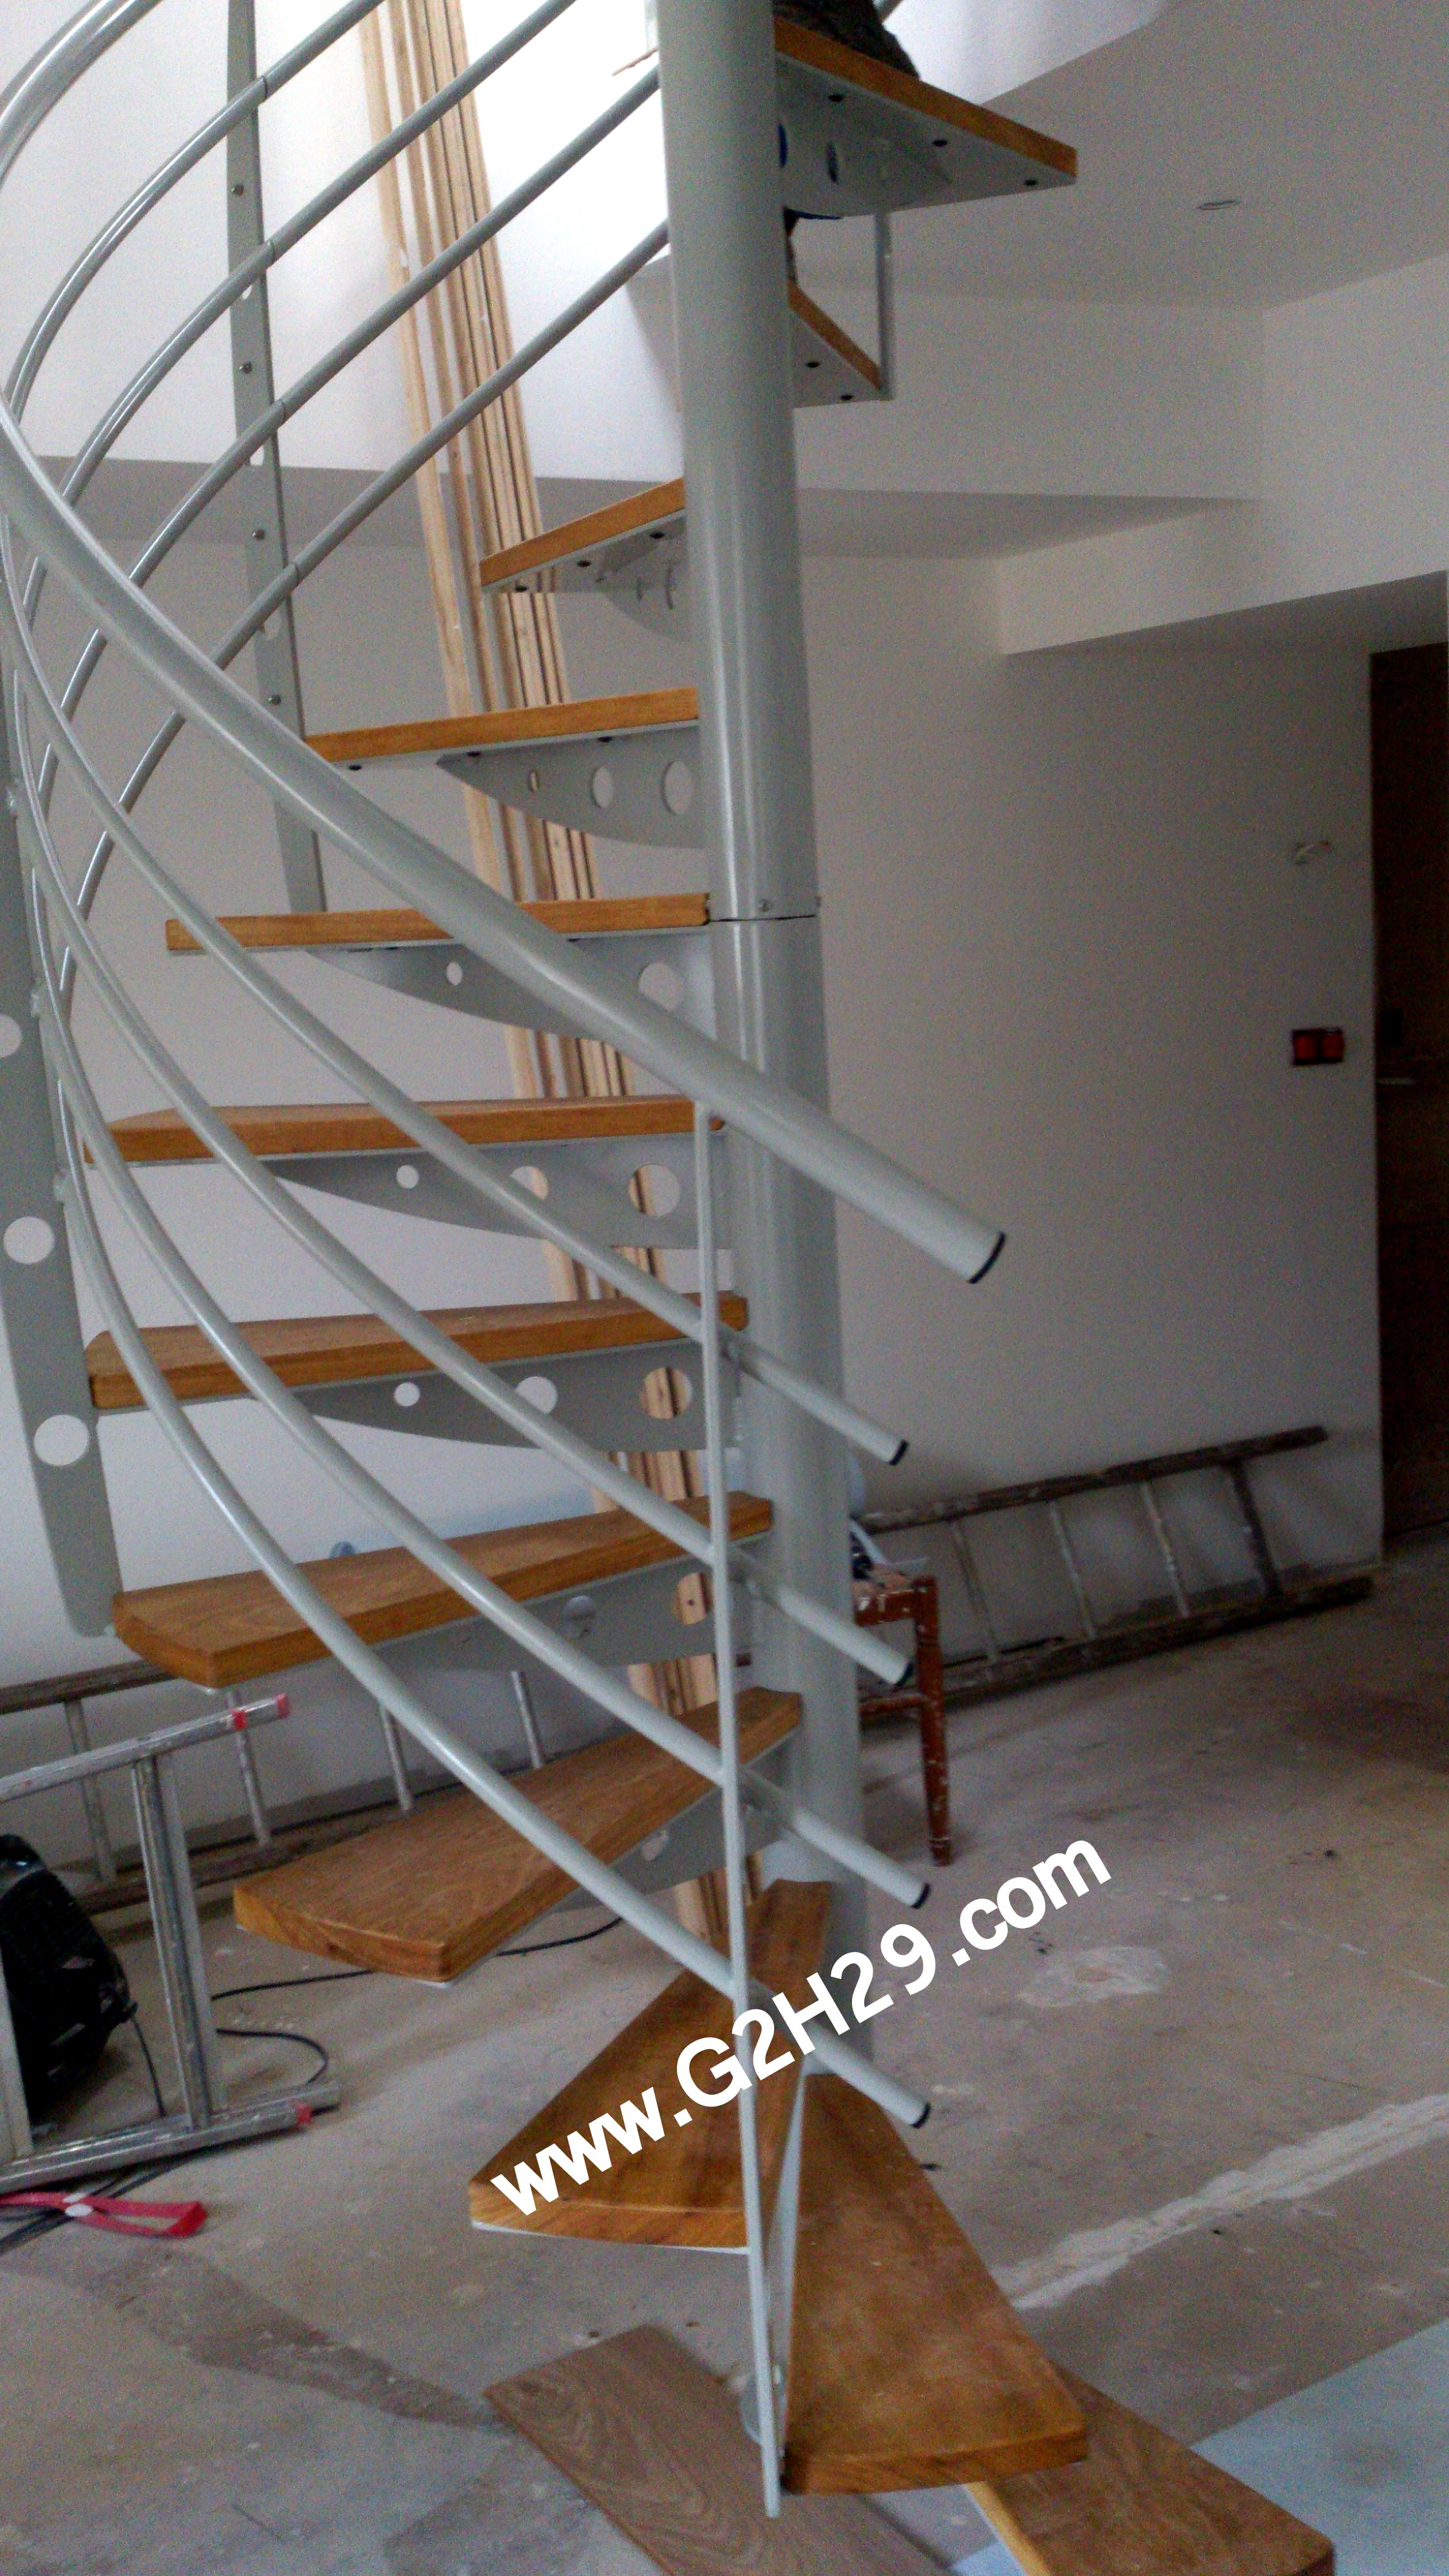 escalier helicoidal castorama marches escalier colimacon with escalier helicoidal castorama. Black Bedroom Furniture Sets. Home Design Ideas